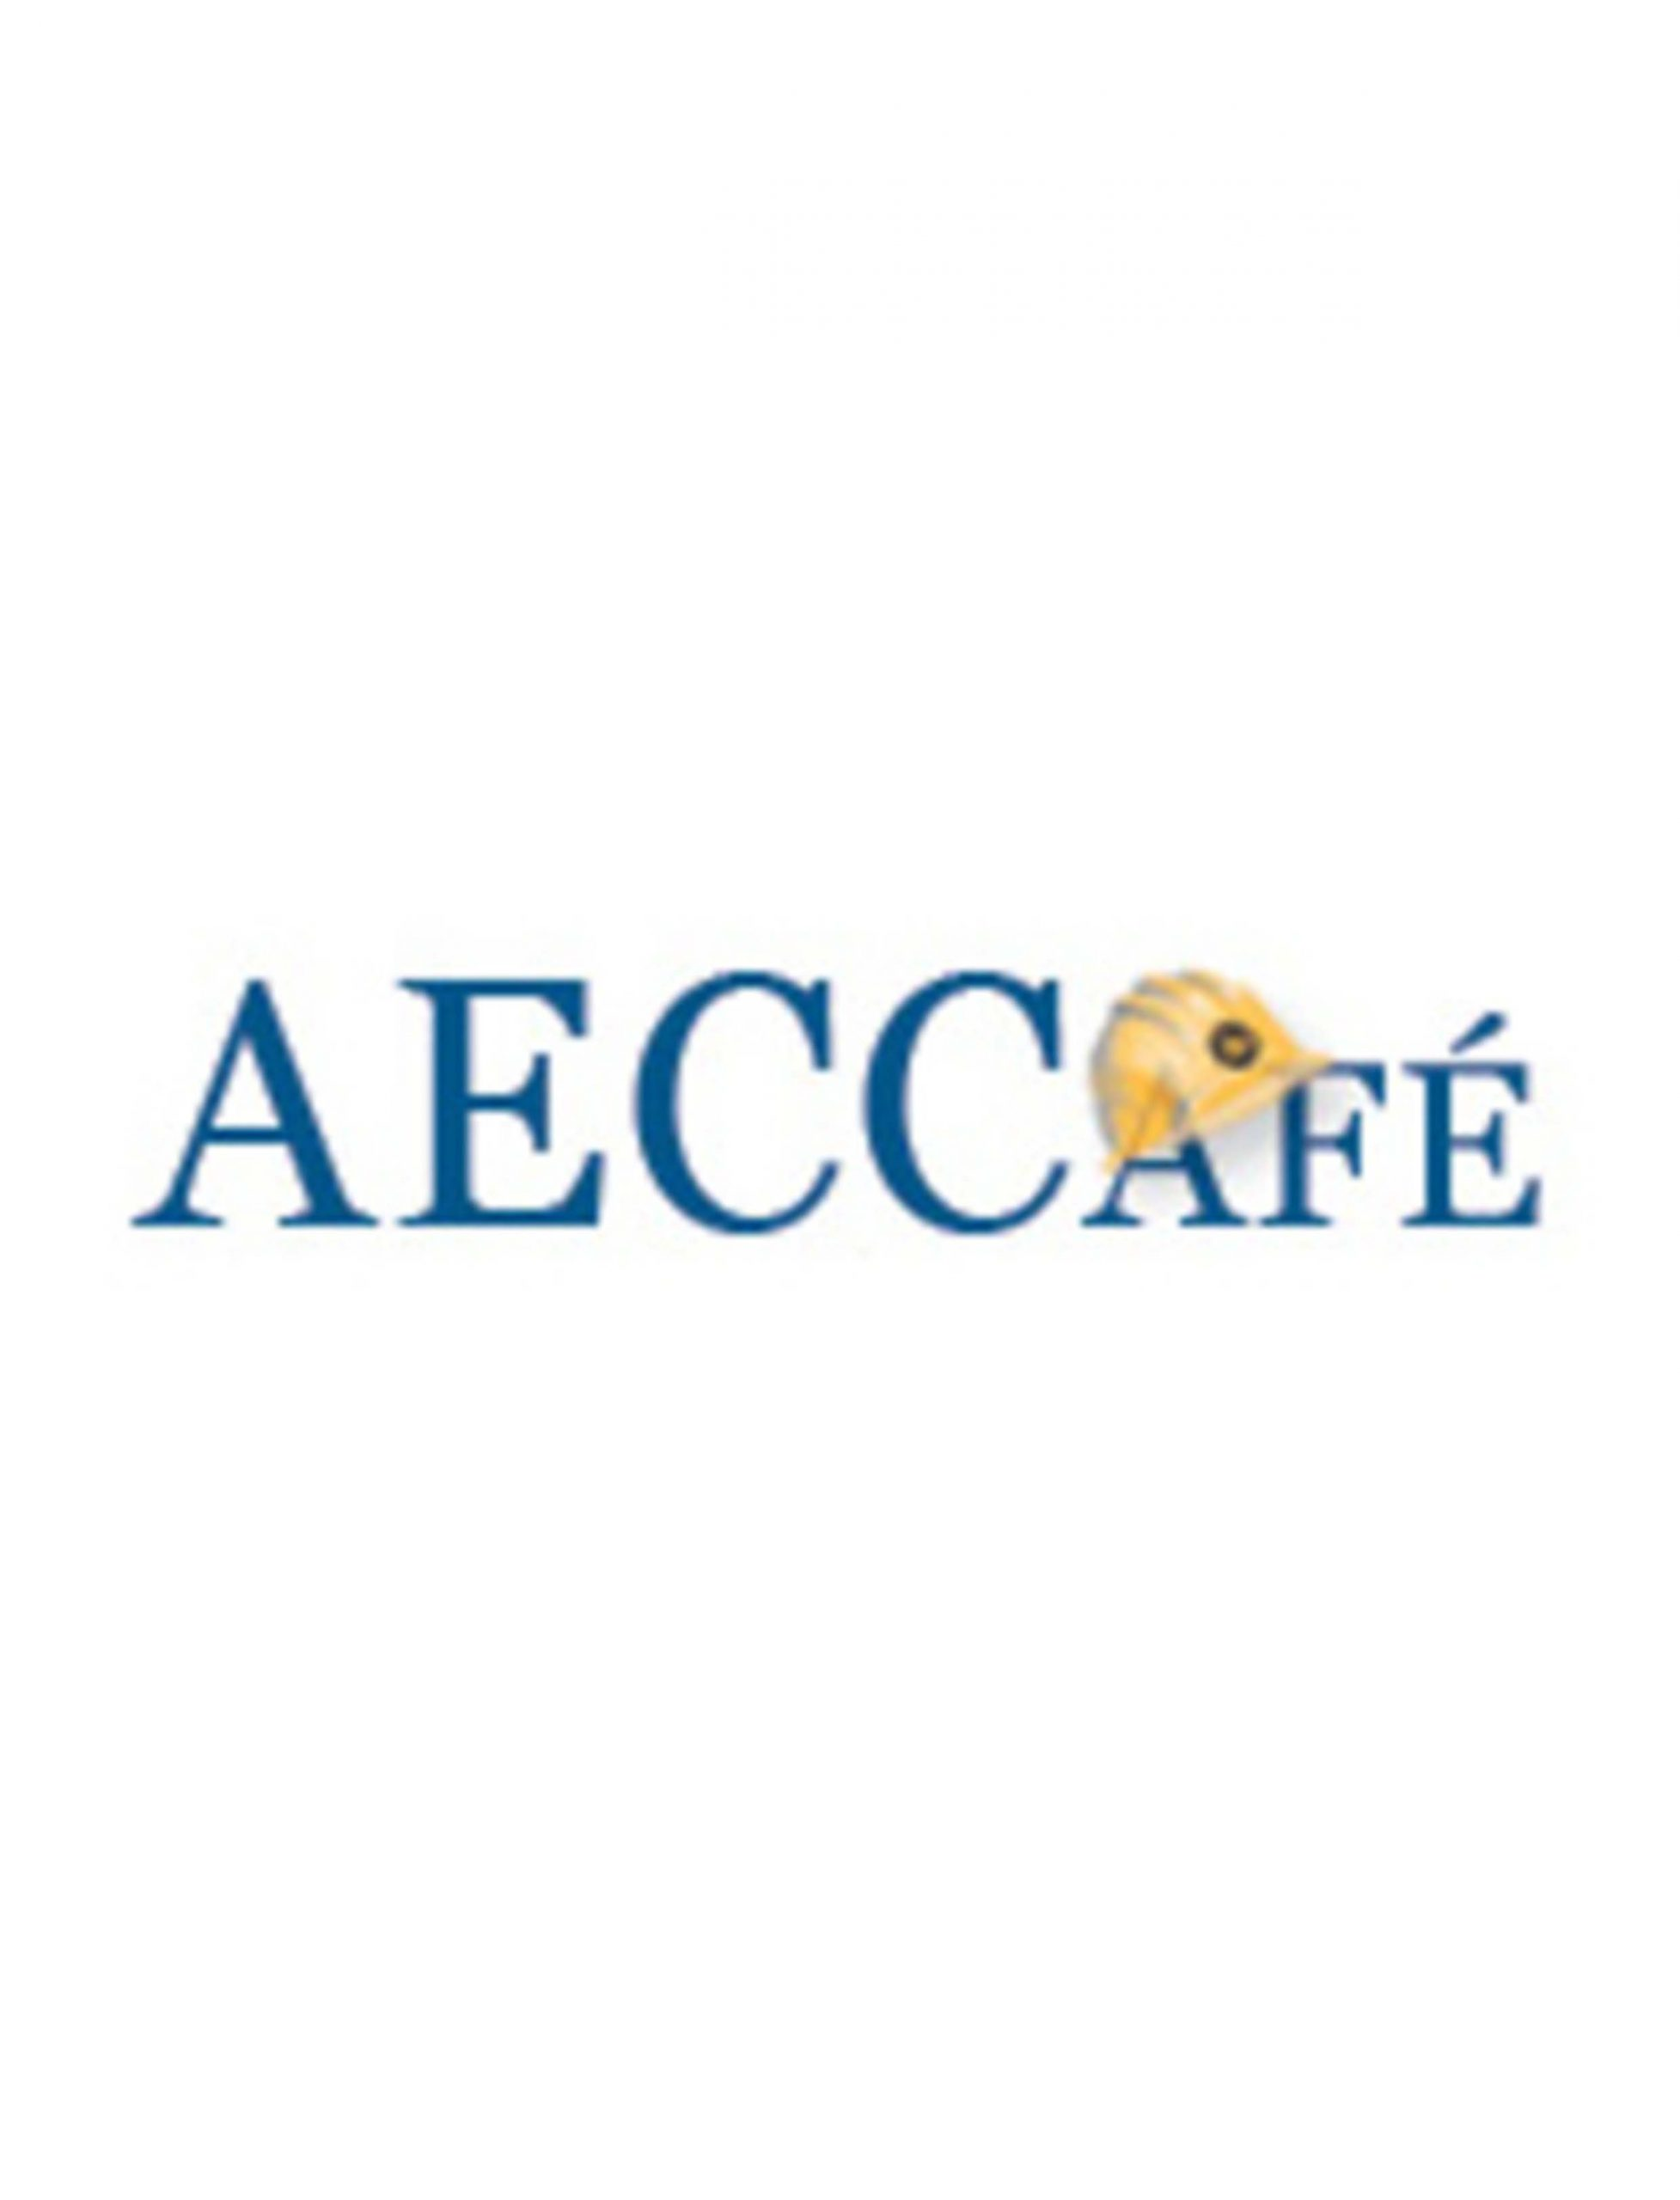 aeccafe portrait